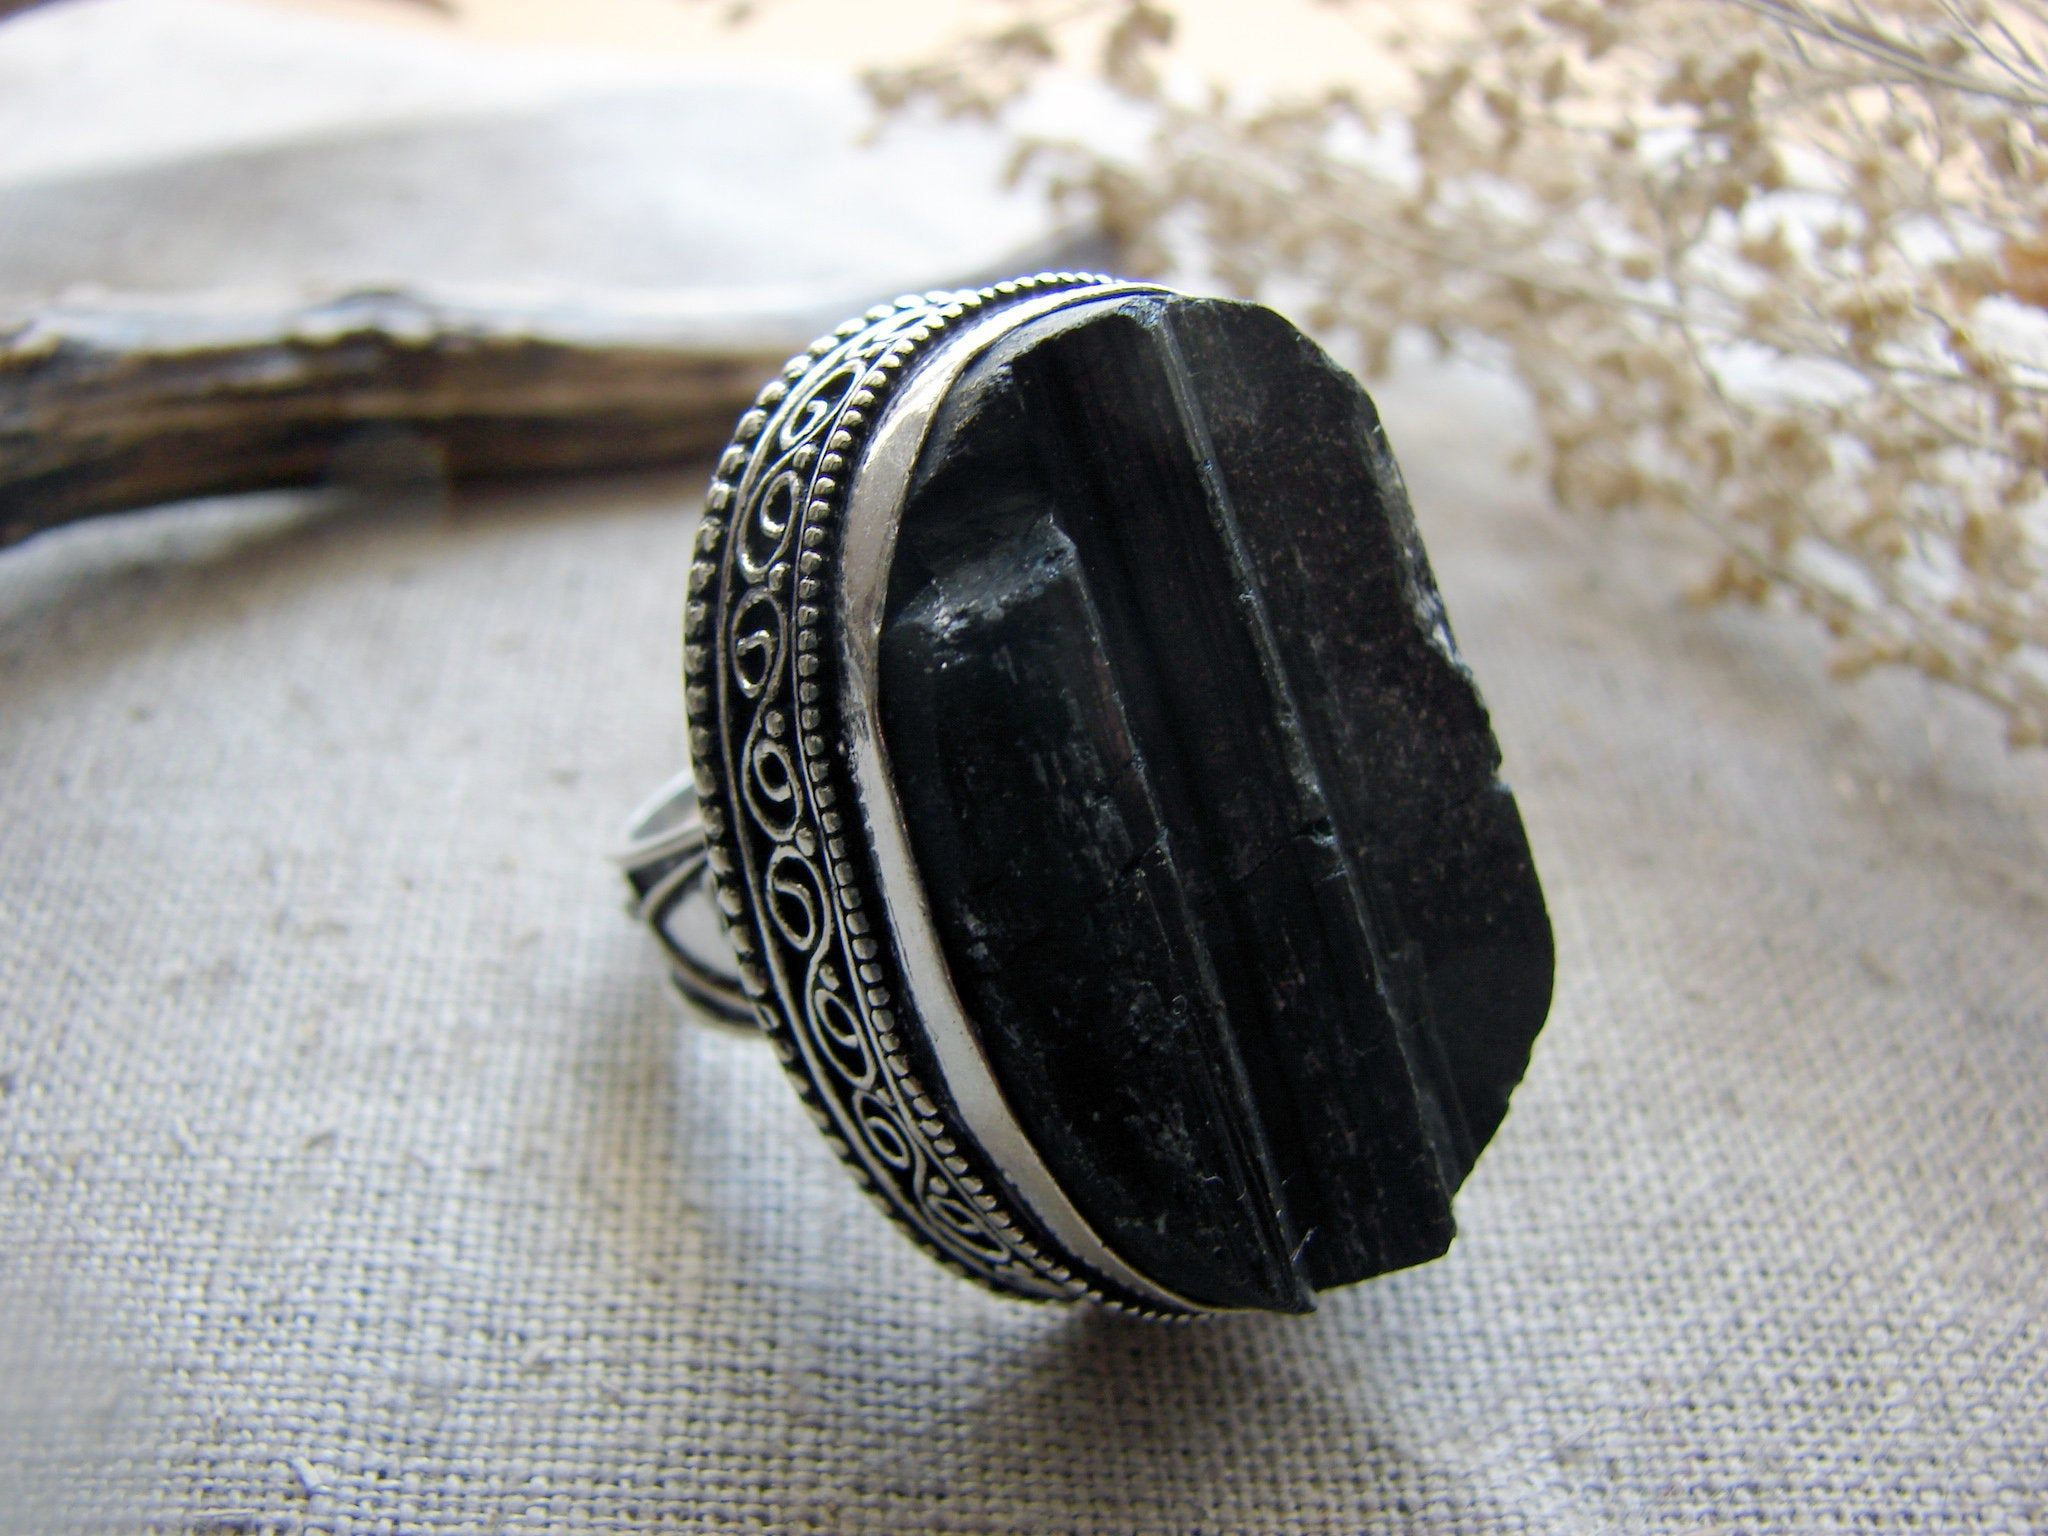 Black Tourmaline Schorl Witch Ring Size 7 1 4 Big Raw Stone Etsy Black Tourmaline Ring Witch Rings Black Tourmaline